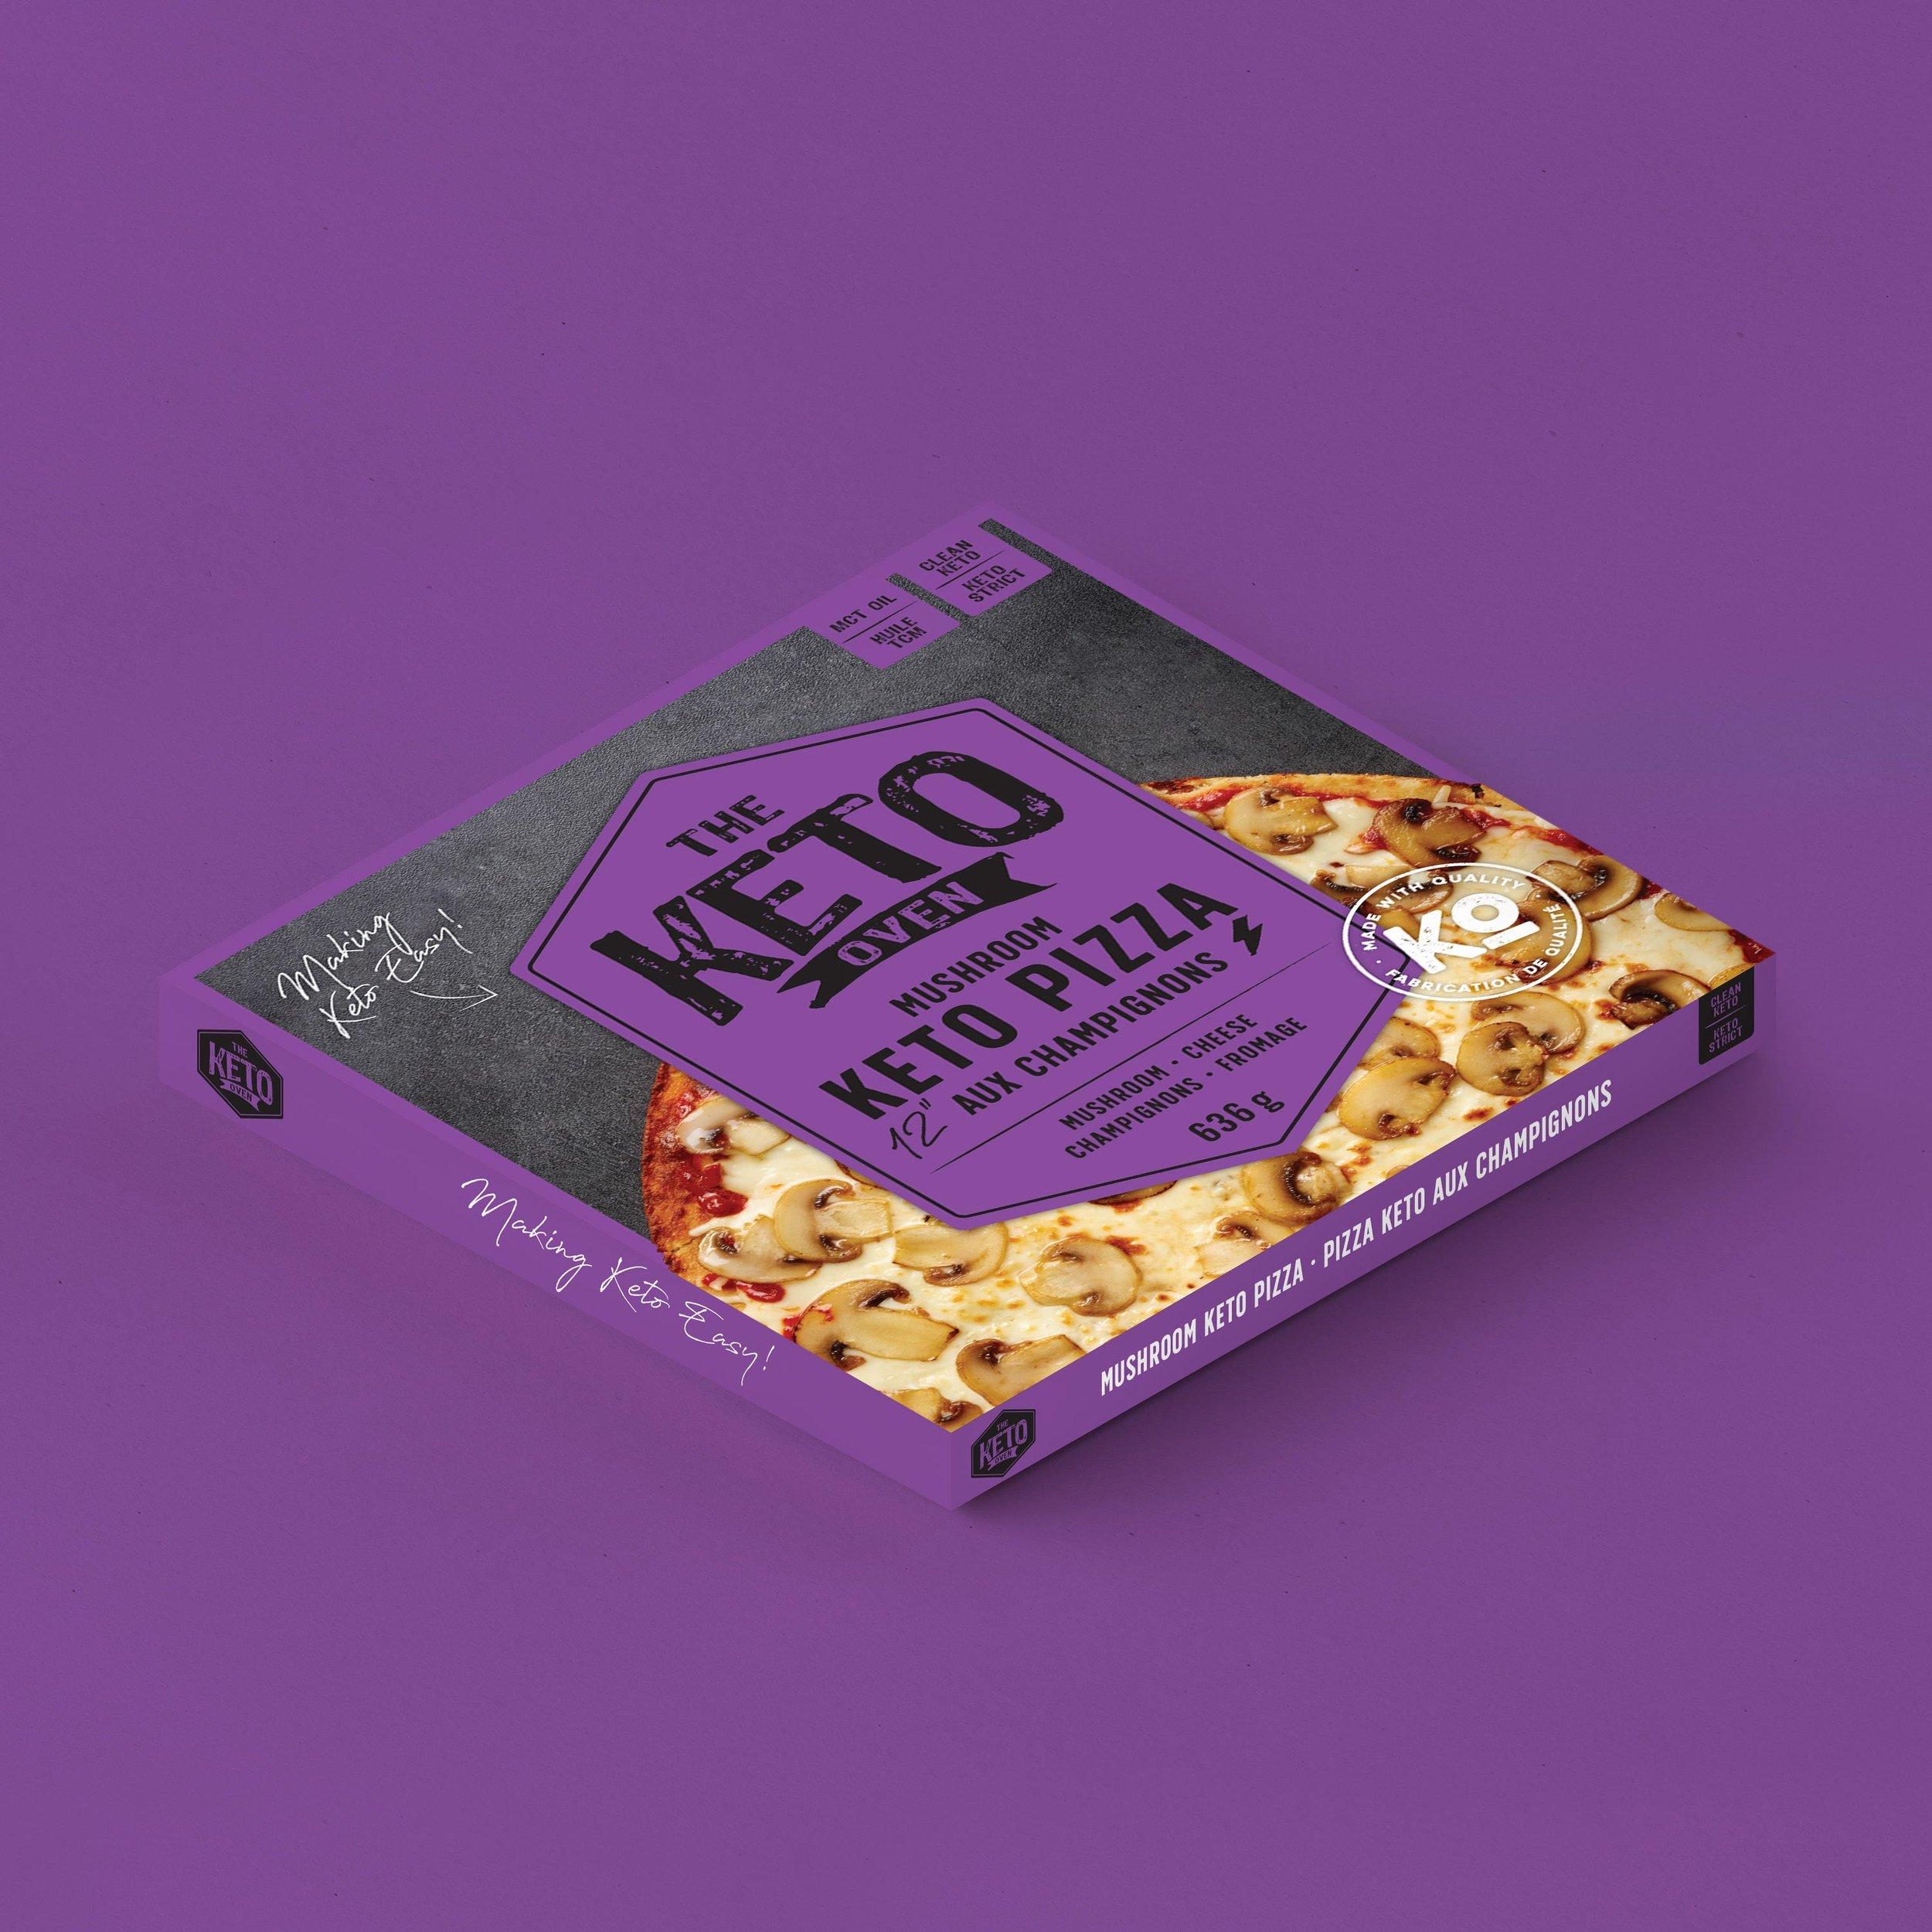 The Keto Oven Mushroom Pizza.jpg